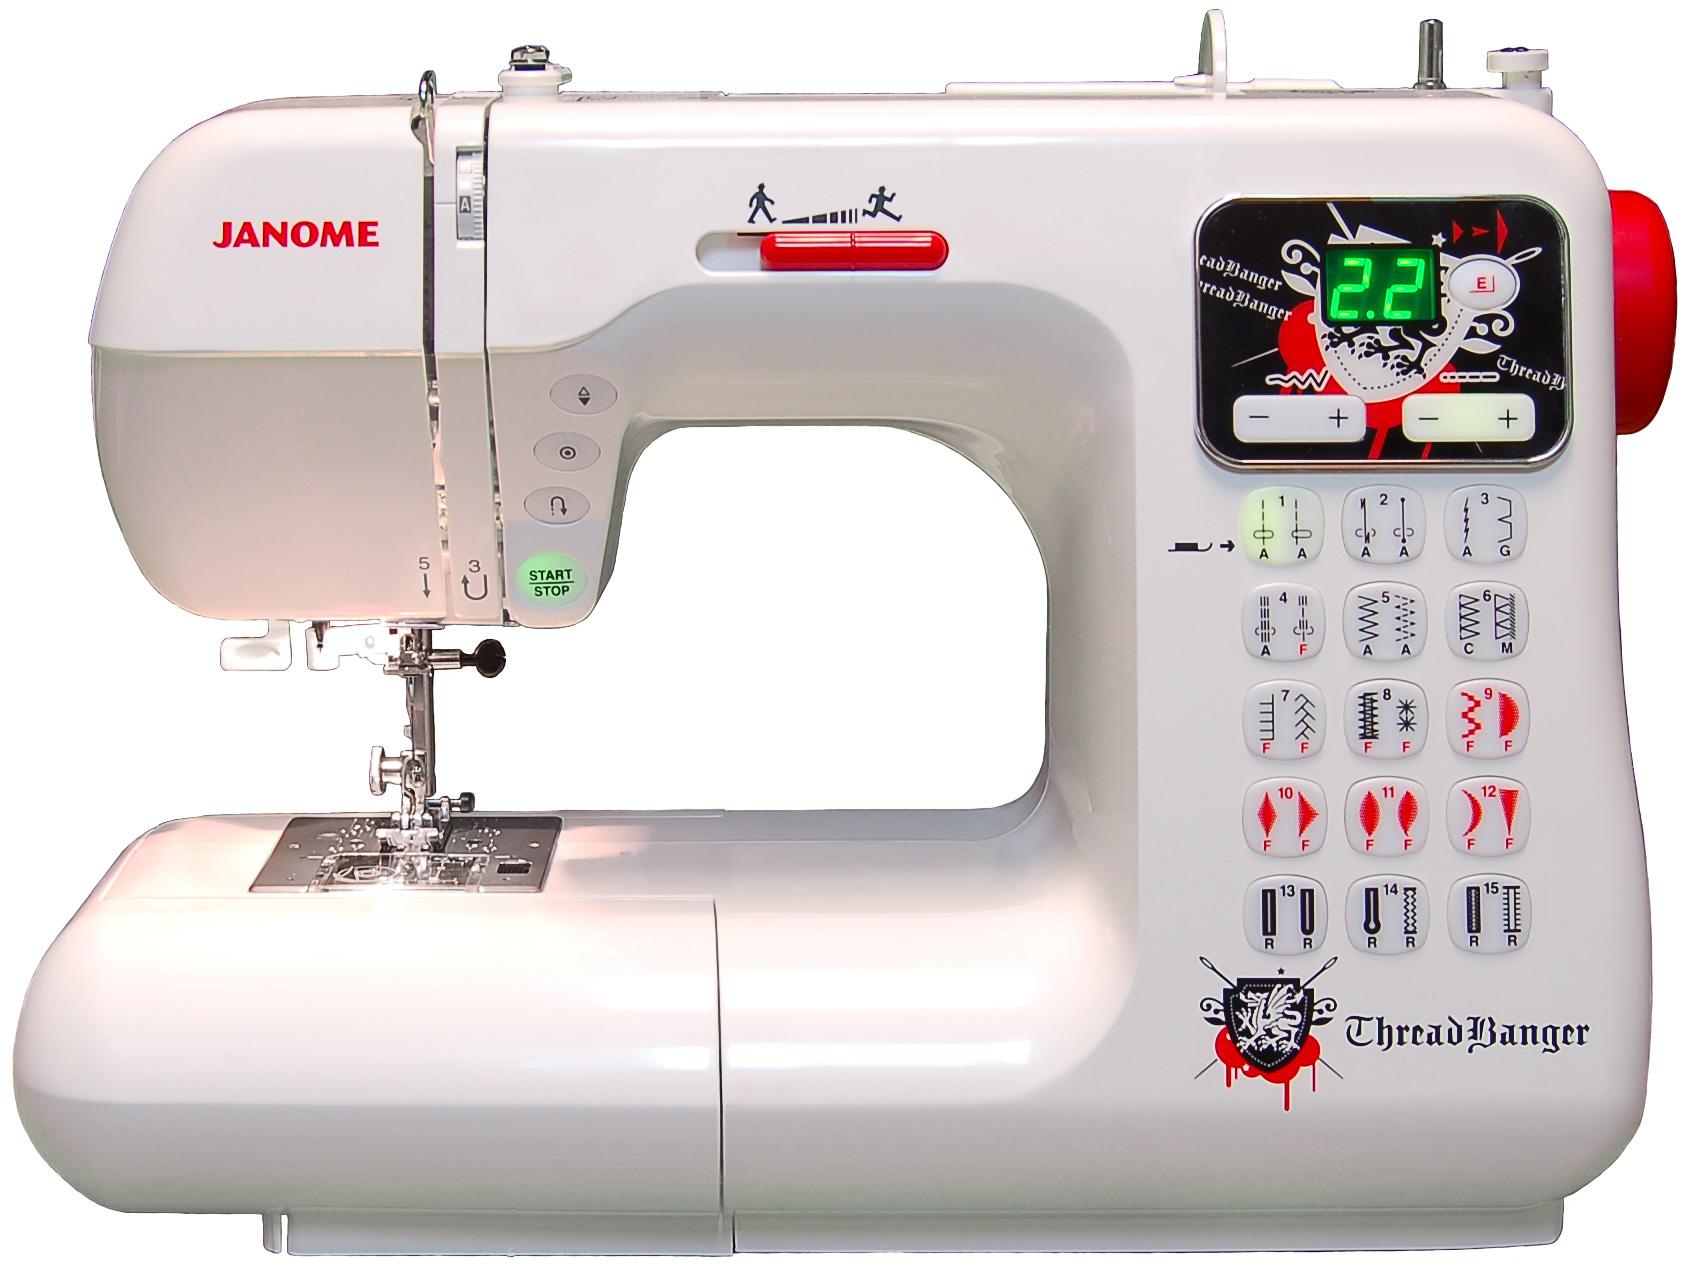 Janome TB30 Threadbanger Computerized Sewing Machine